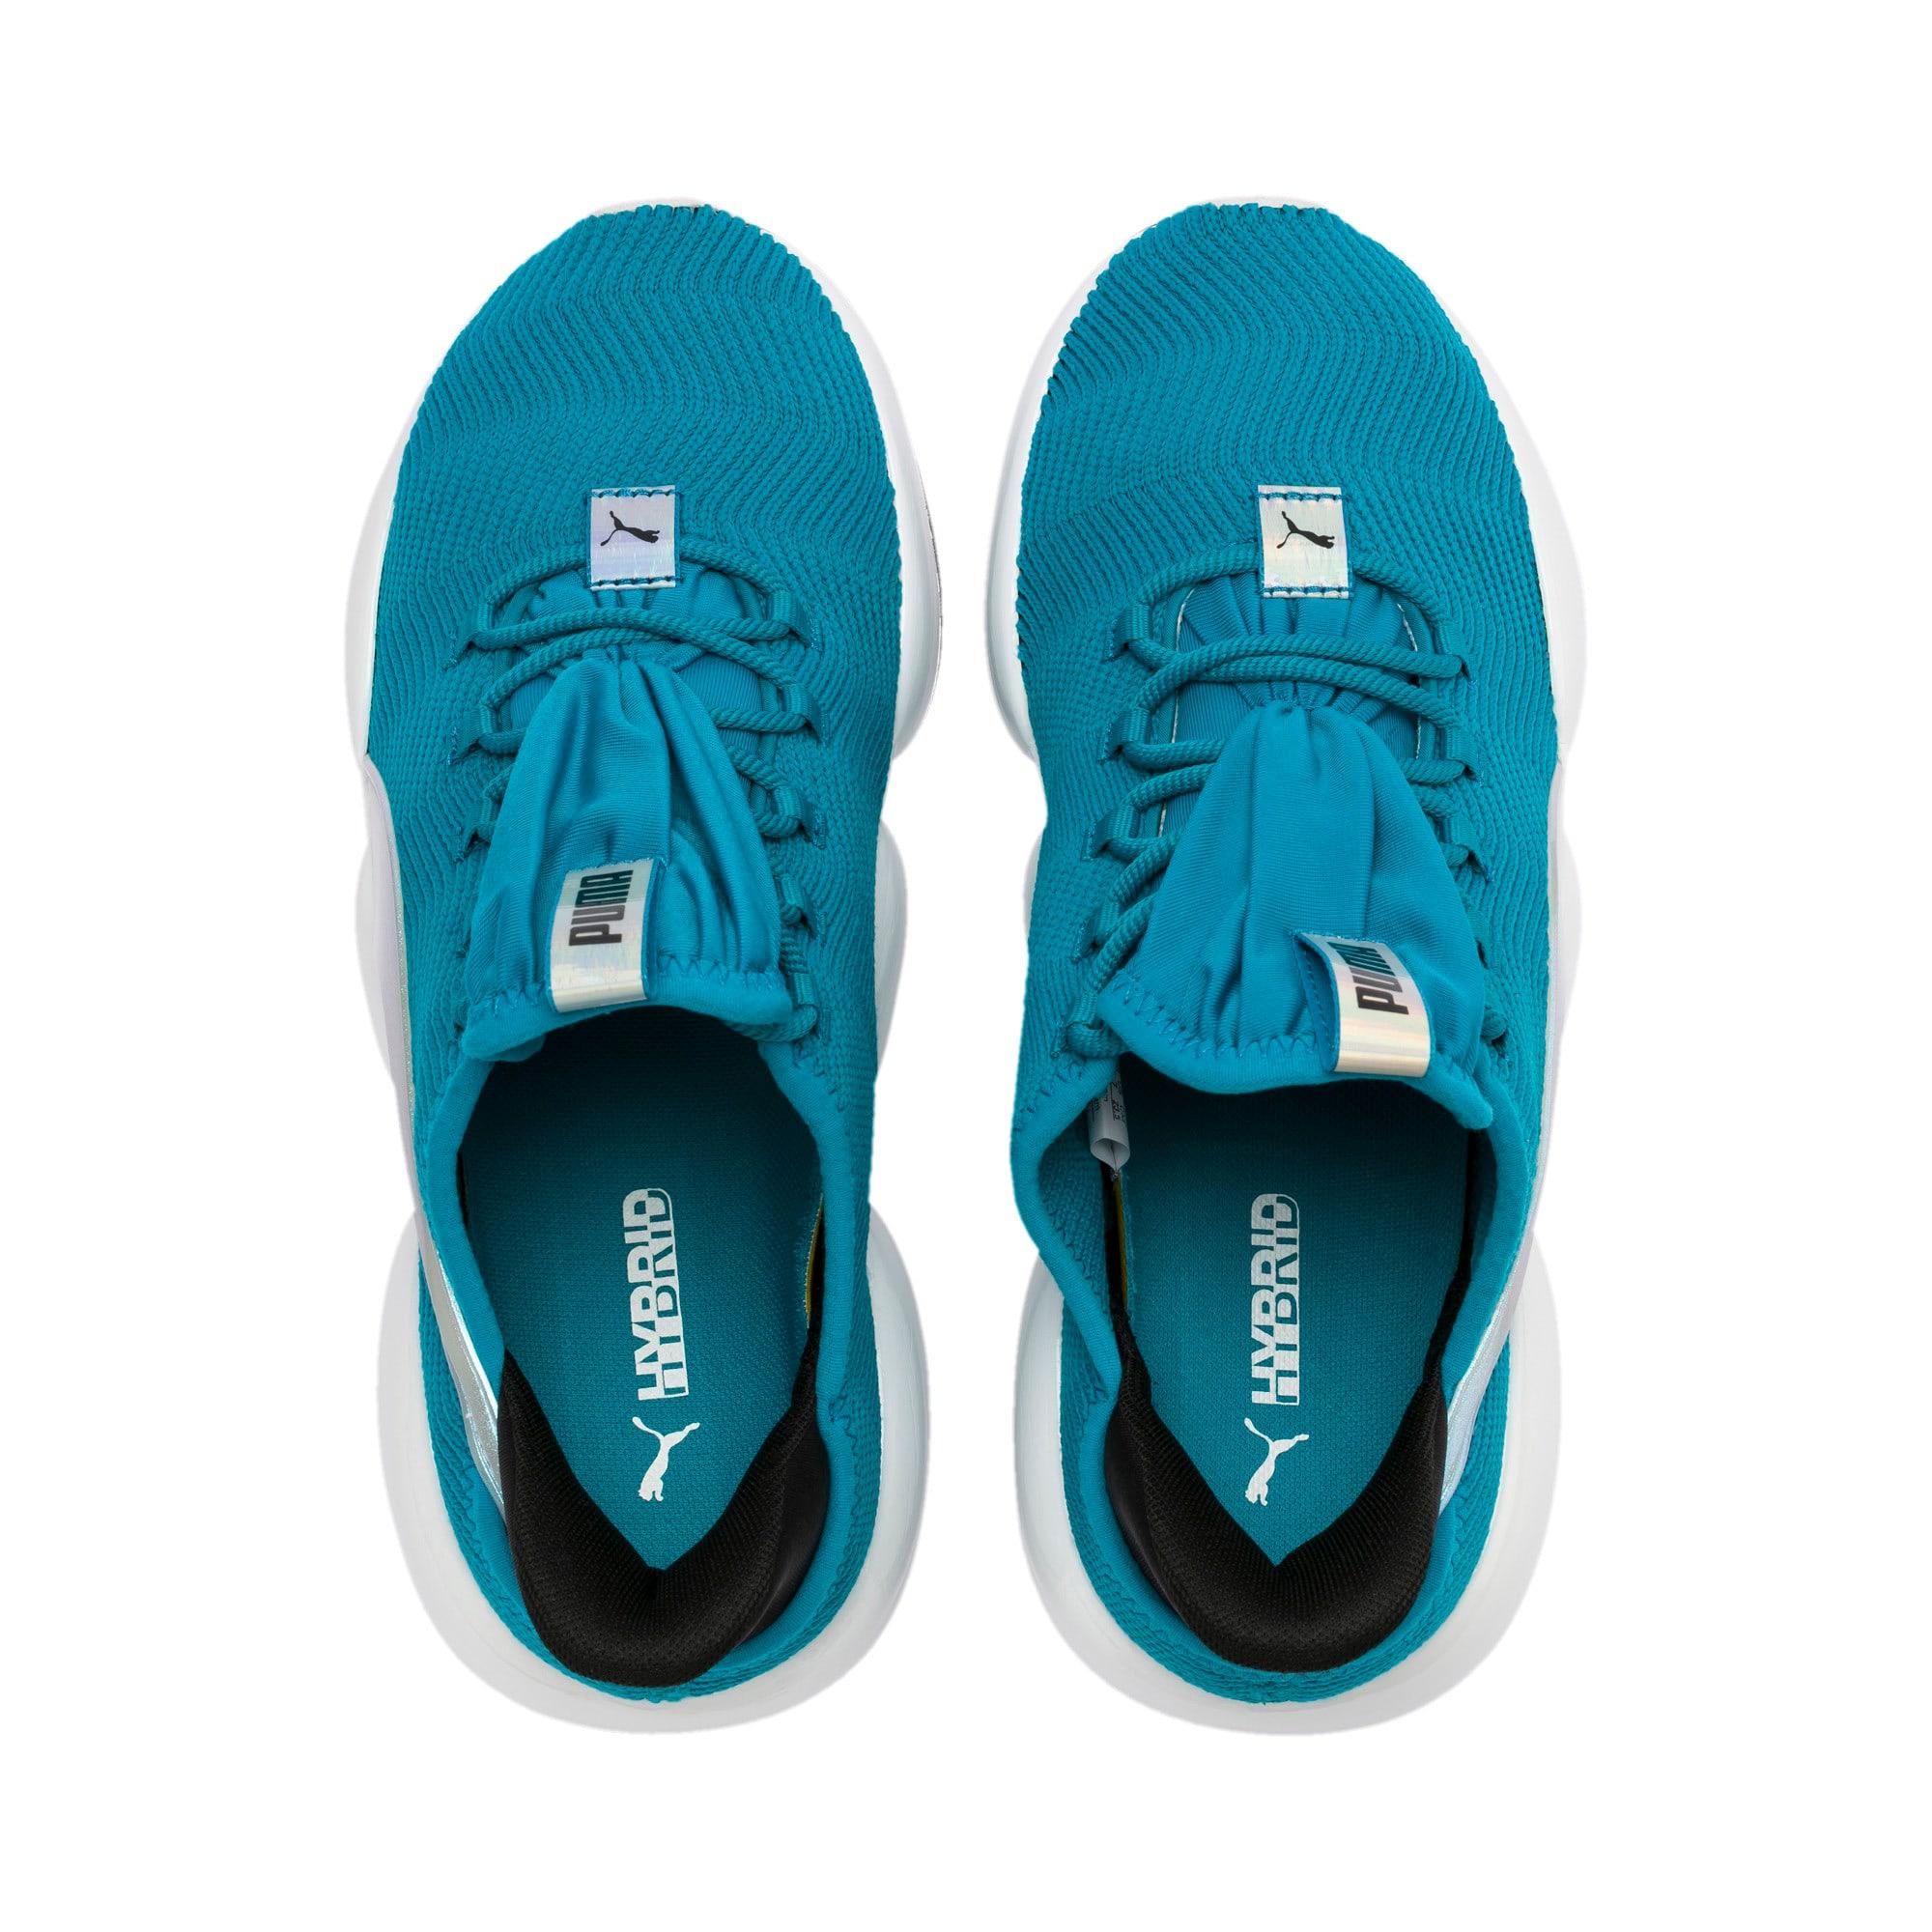 Thumbnail 7 of Mode XT Trailblazer Iridescent Women's Training Shoes, Caribbean Sea-Puma White, medium